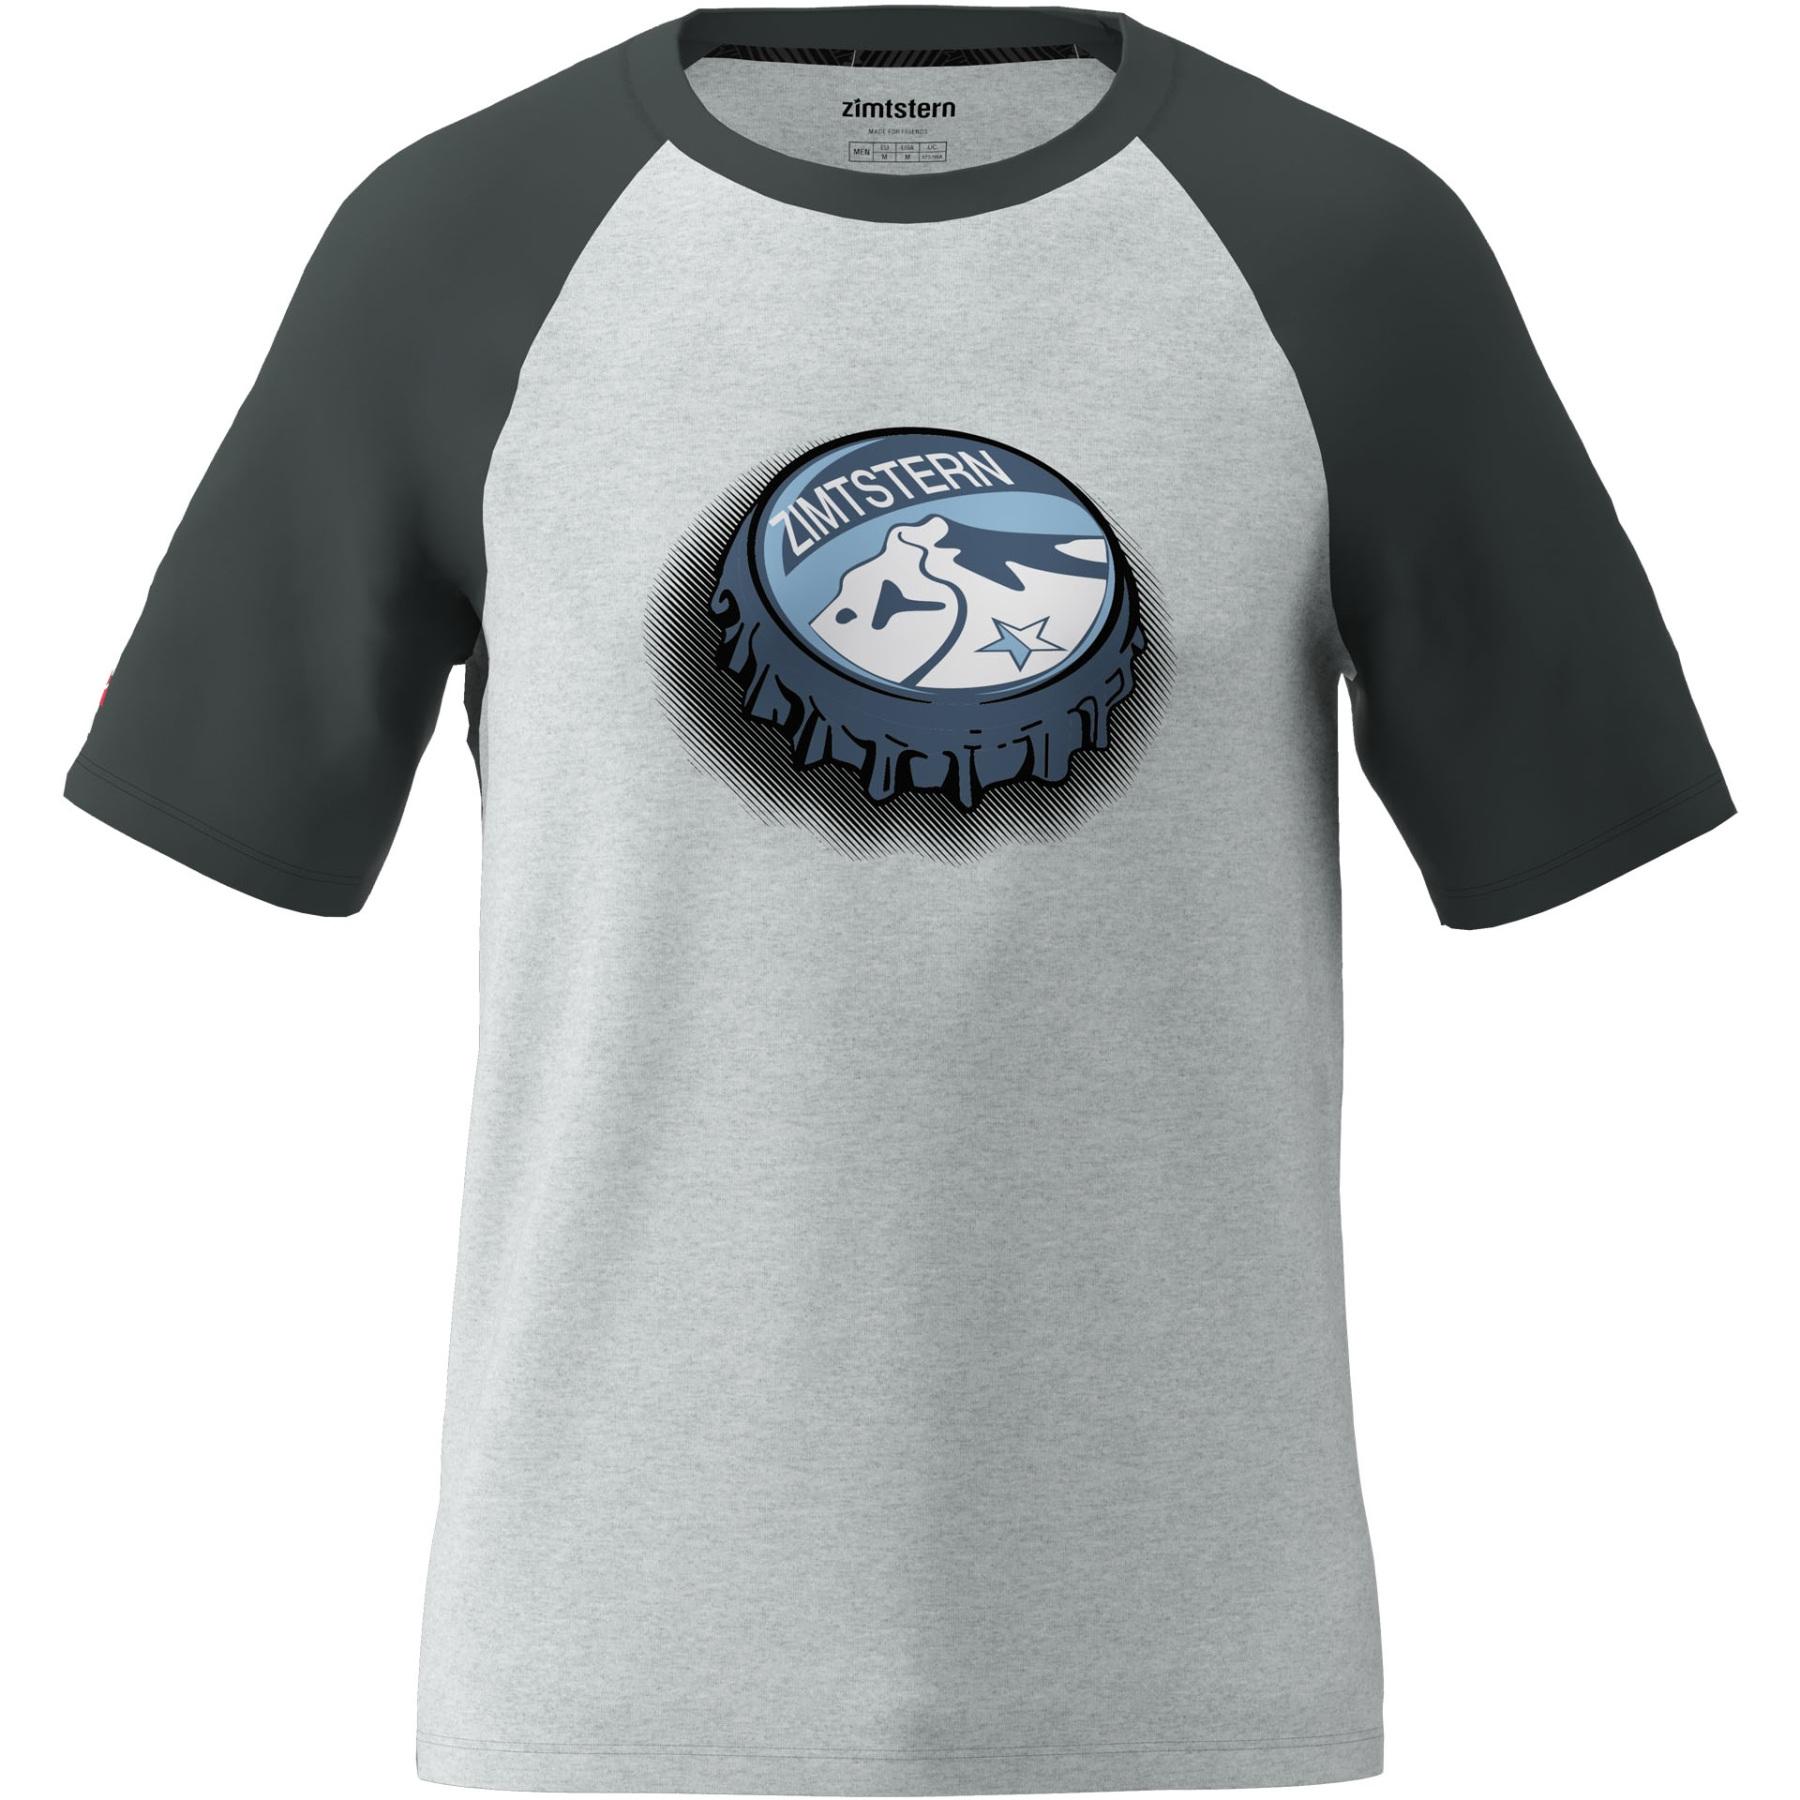 Zimtstern Cupz T-Shirt - glacier grey melange/pirate black